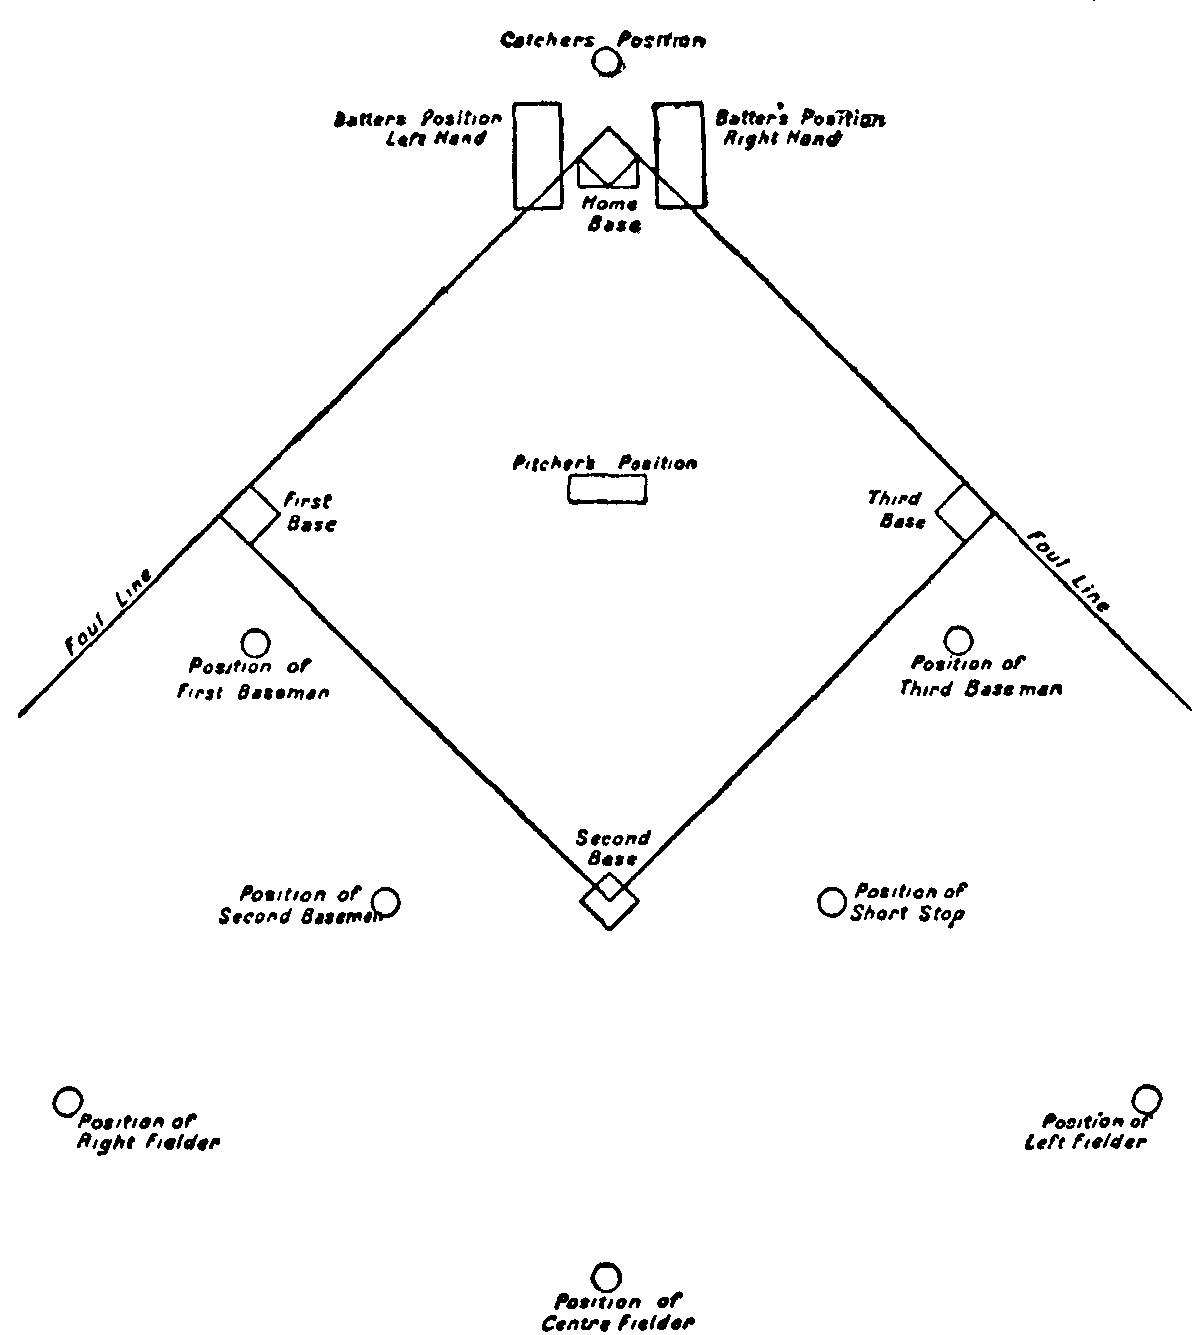 file base-ball 1 png